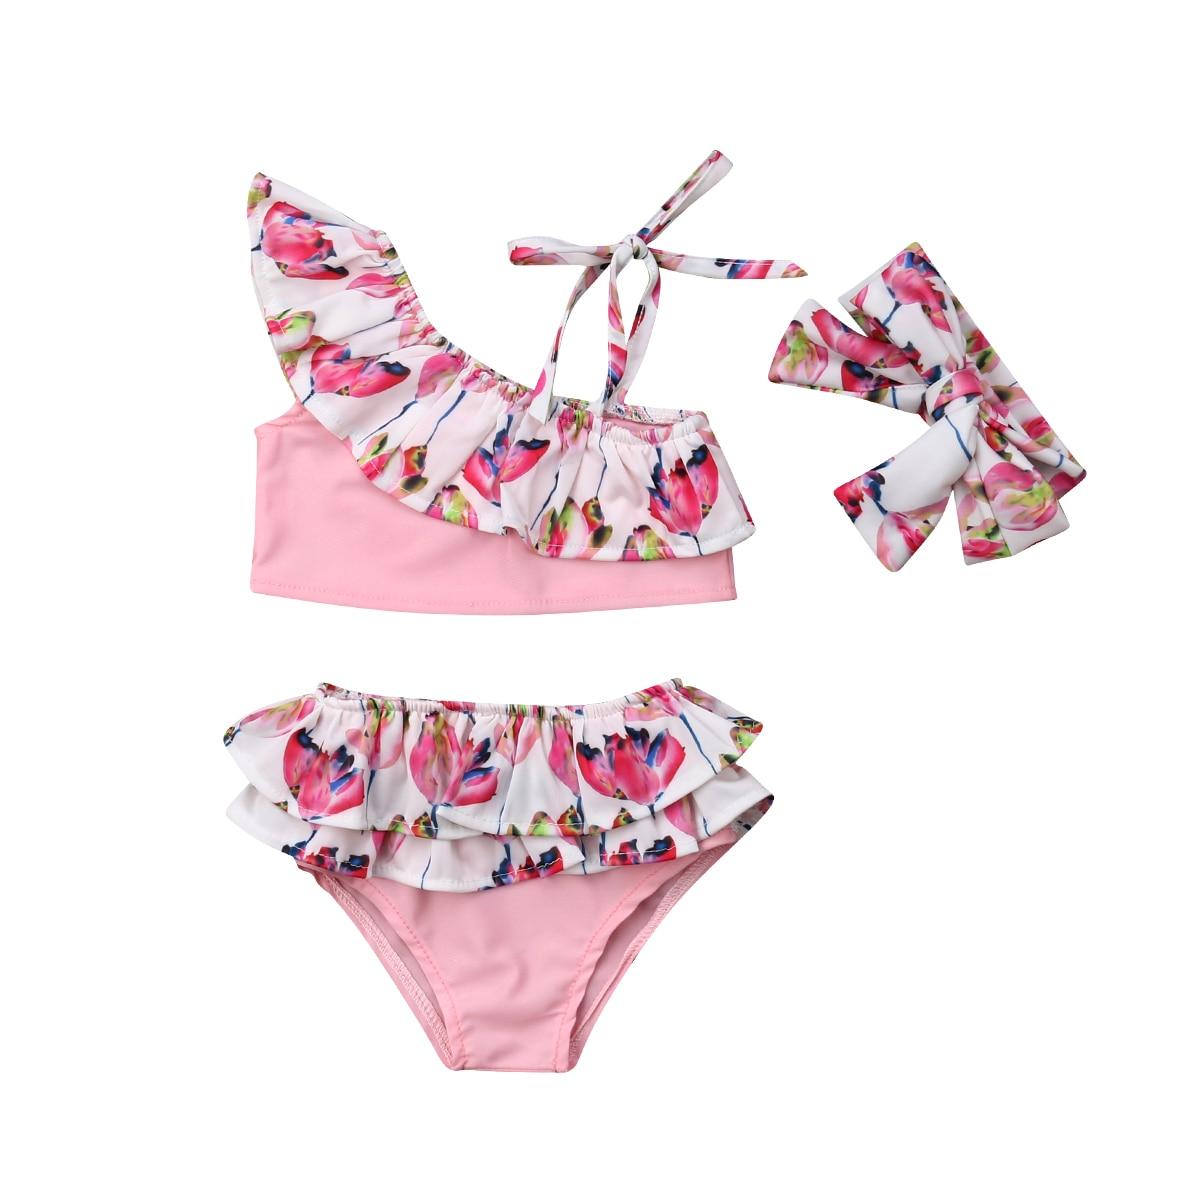 Swimwear Headbands Shorts Tops Bathing-Suit Beachwear Toddler Baby-Girls Summer 3PCS